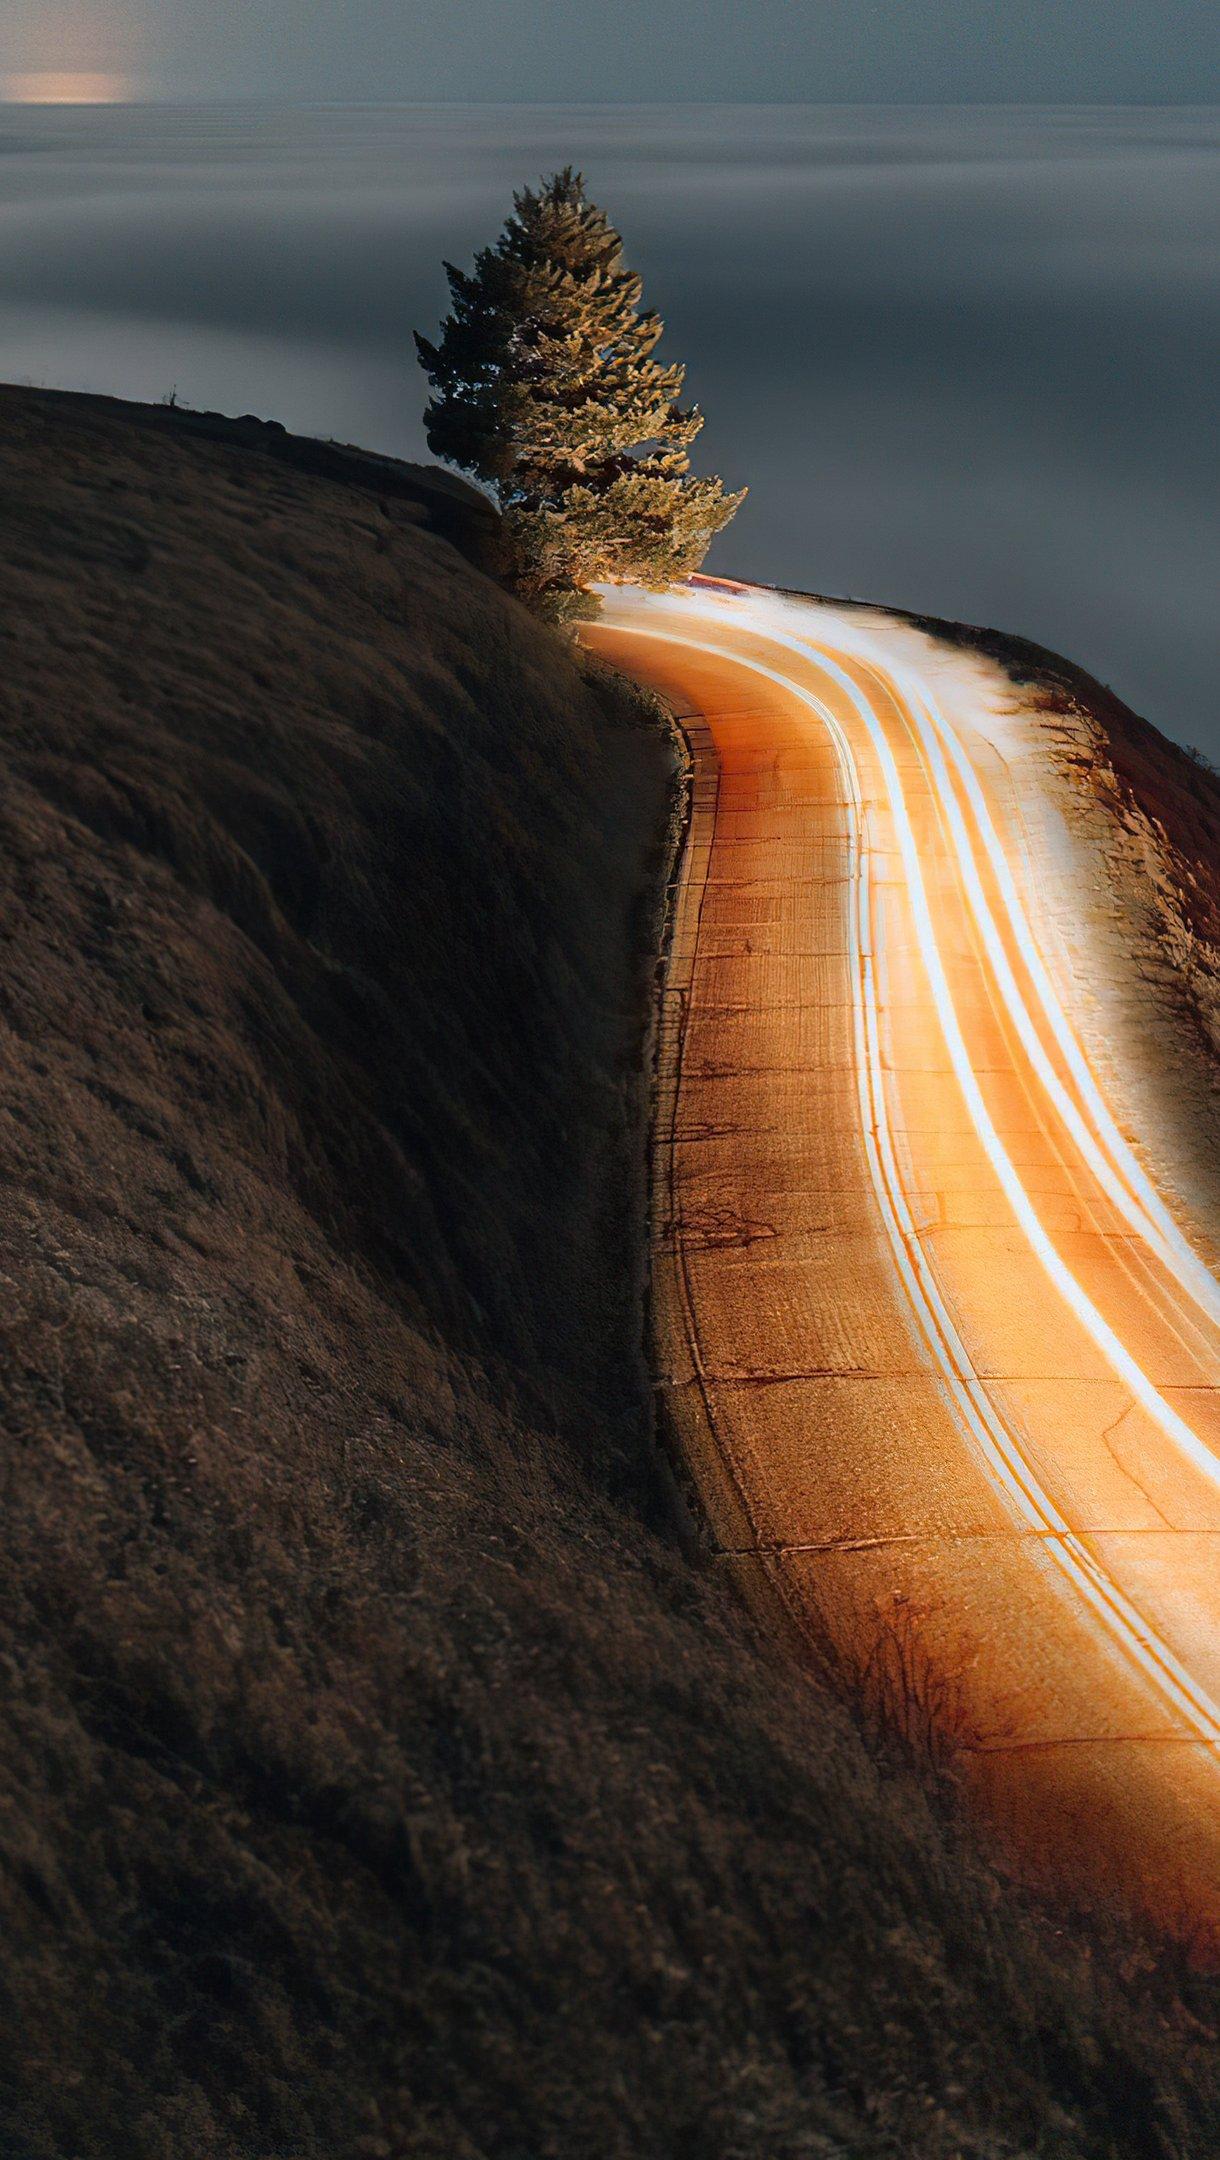 Fondos de pantalla Carretera al amanecer larga exposición Vertical